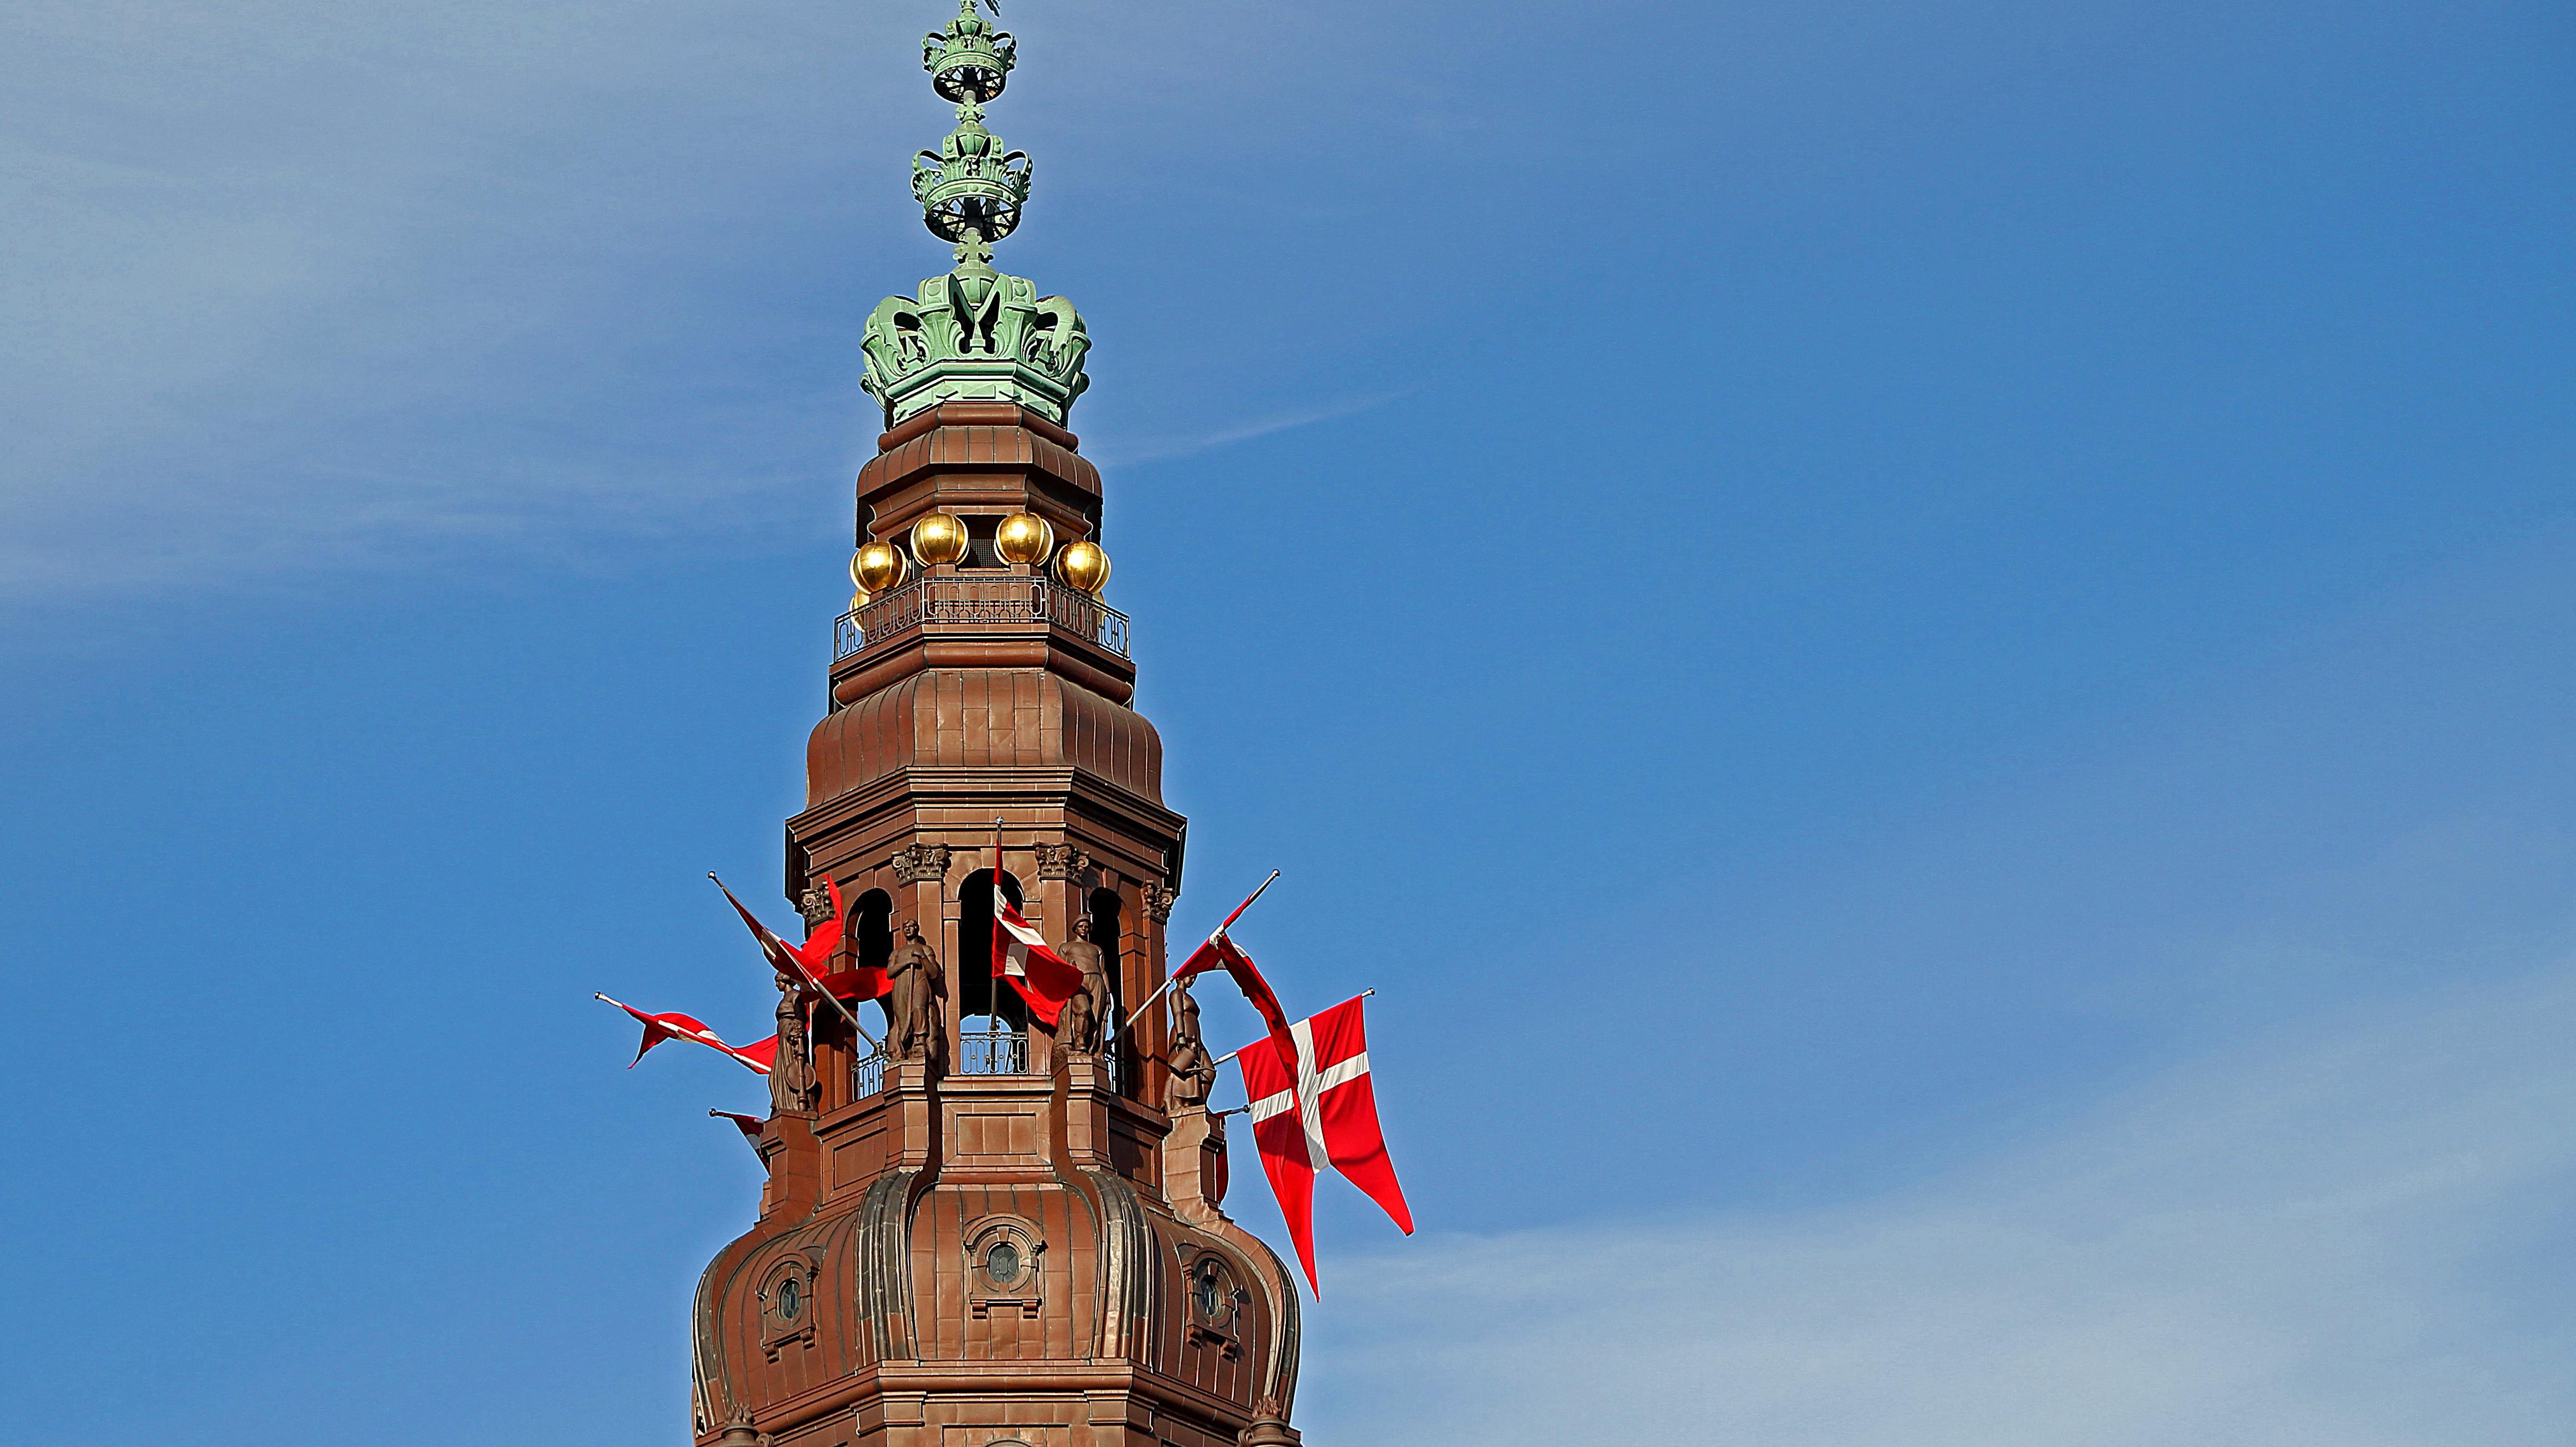 christiansborg flag folketingets åbning